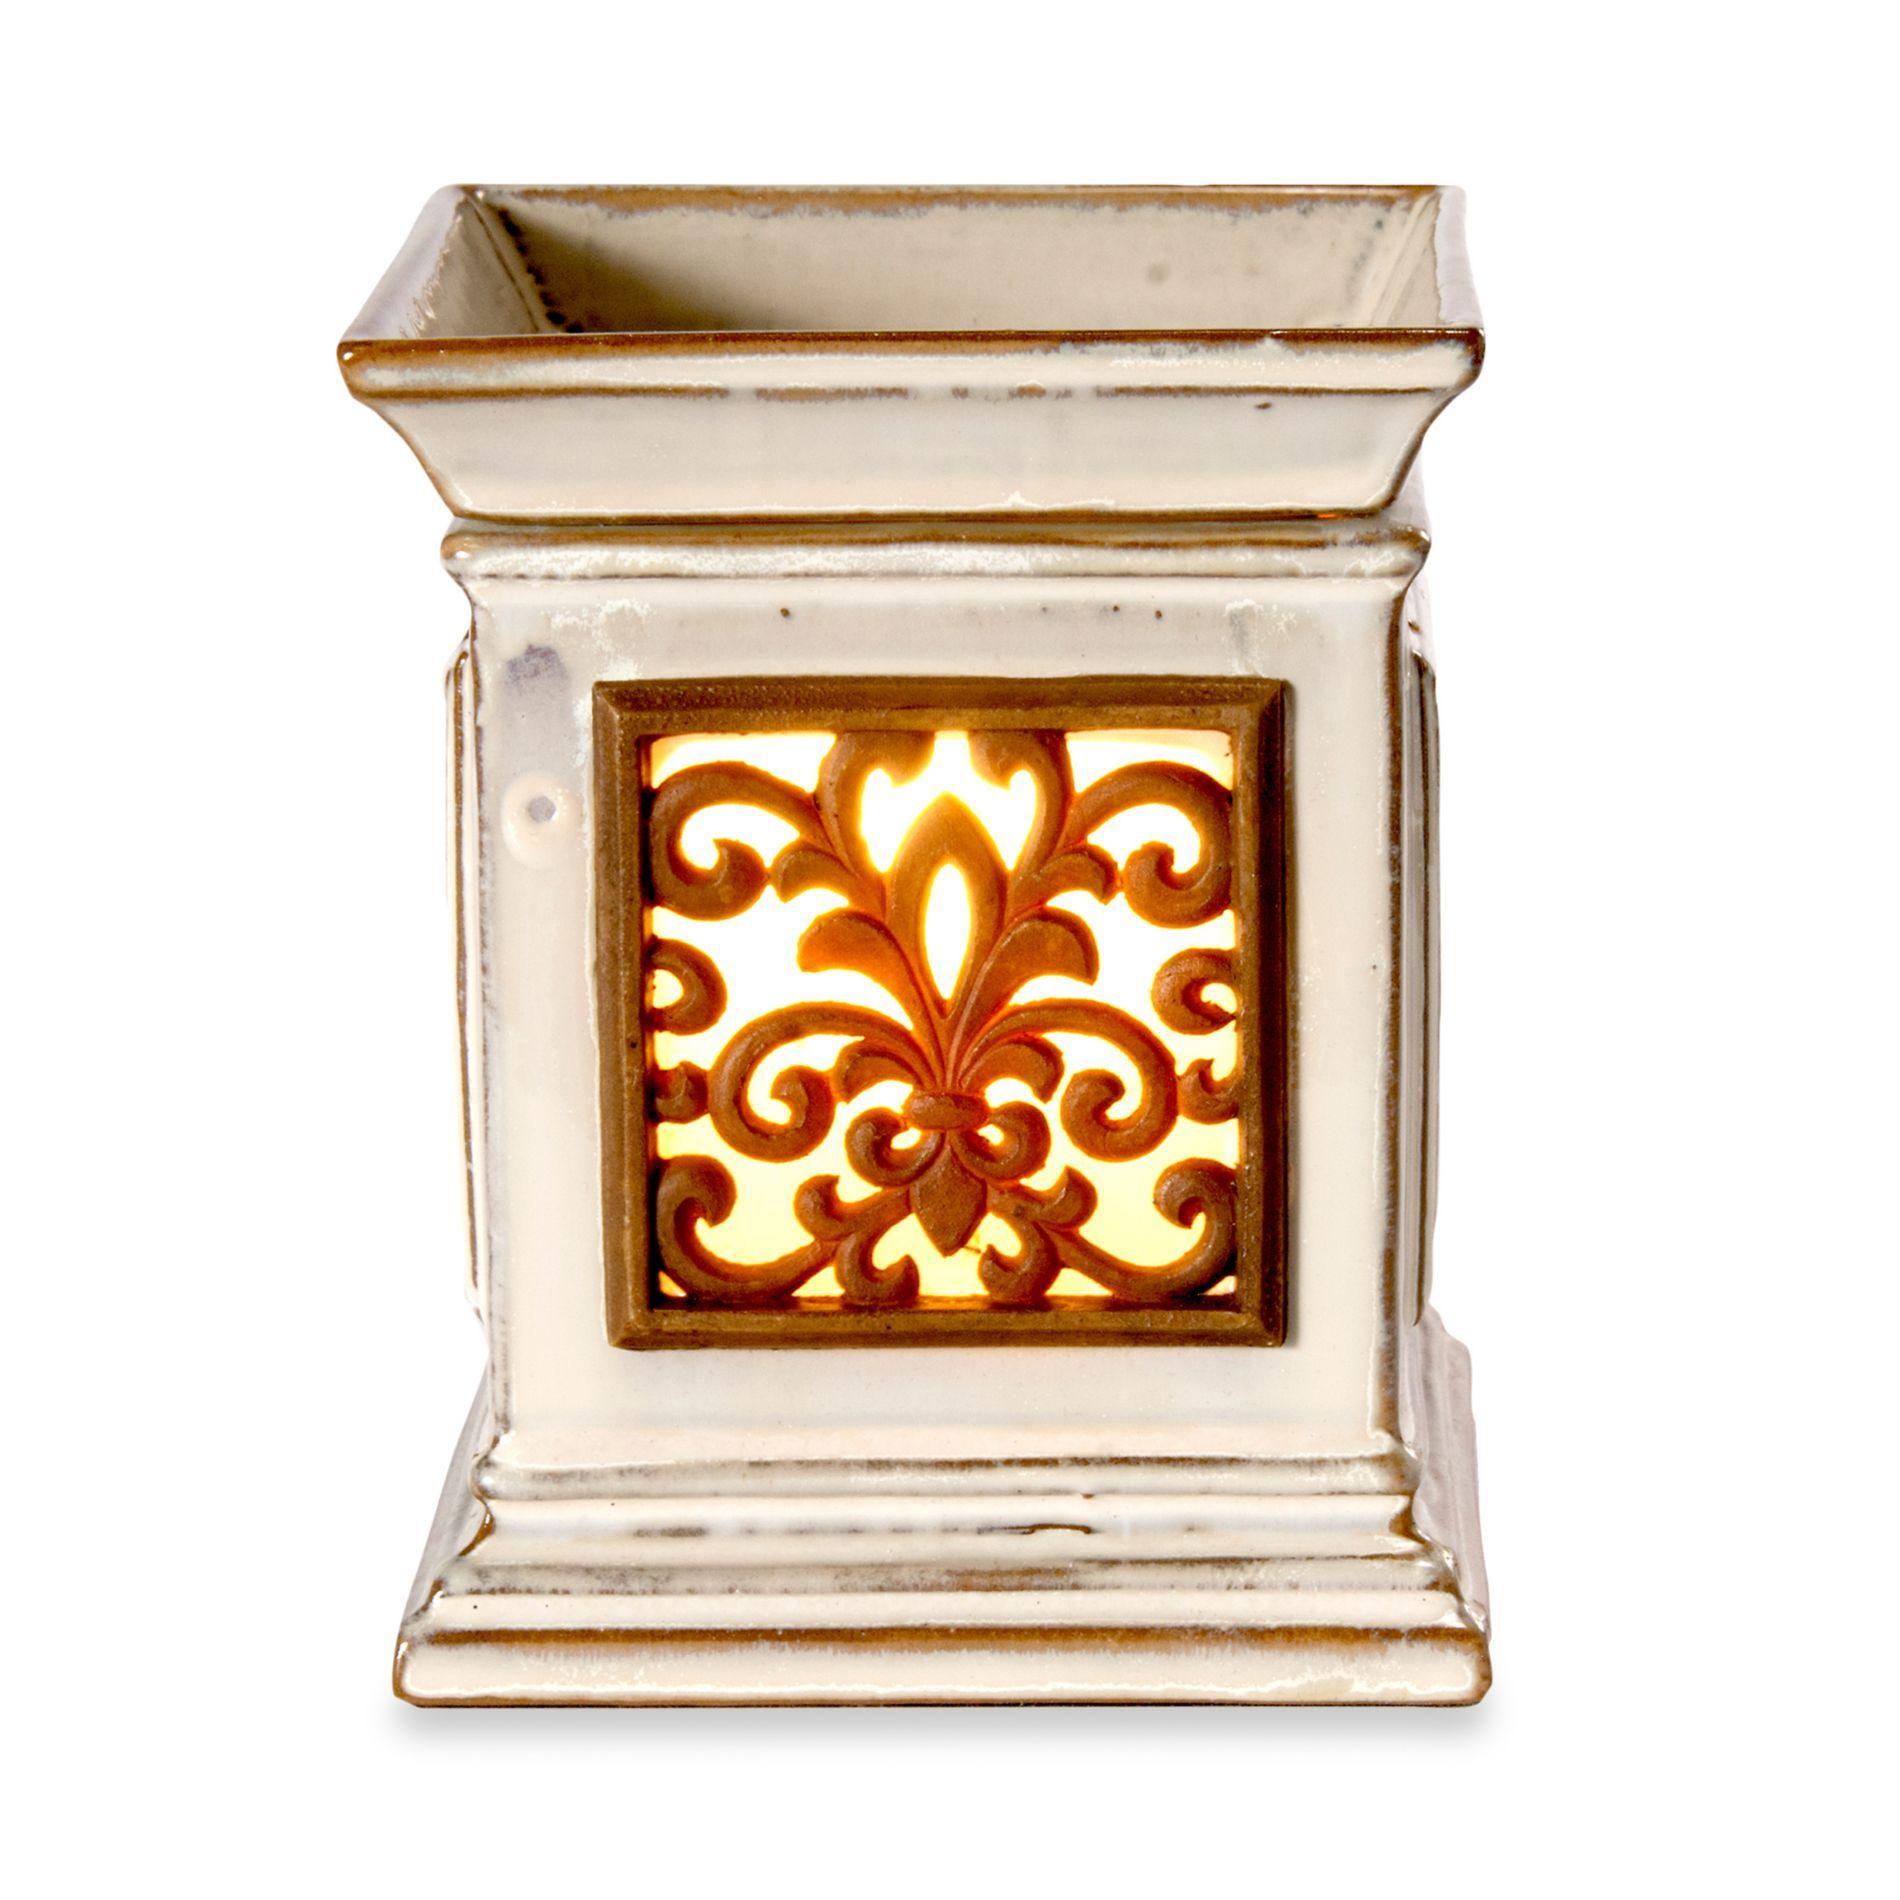 Ambiescents elegance fragrance hearth wax warmer sweet gift ideas